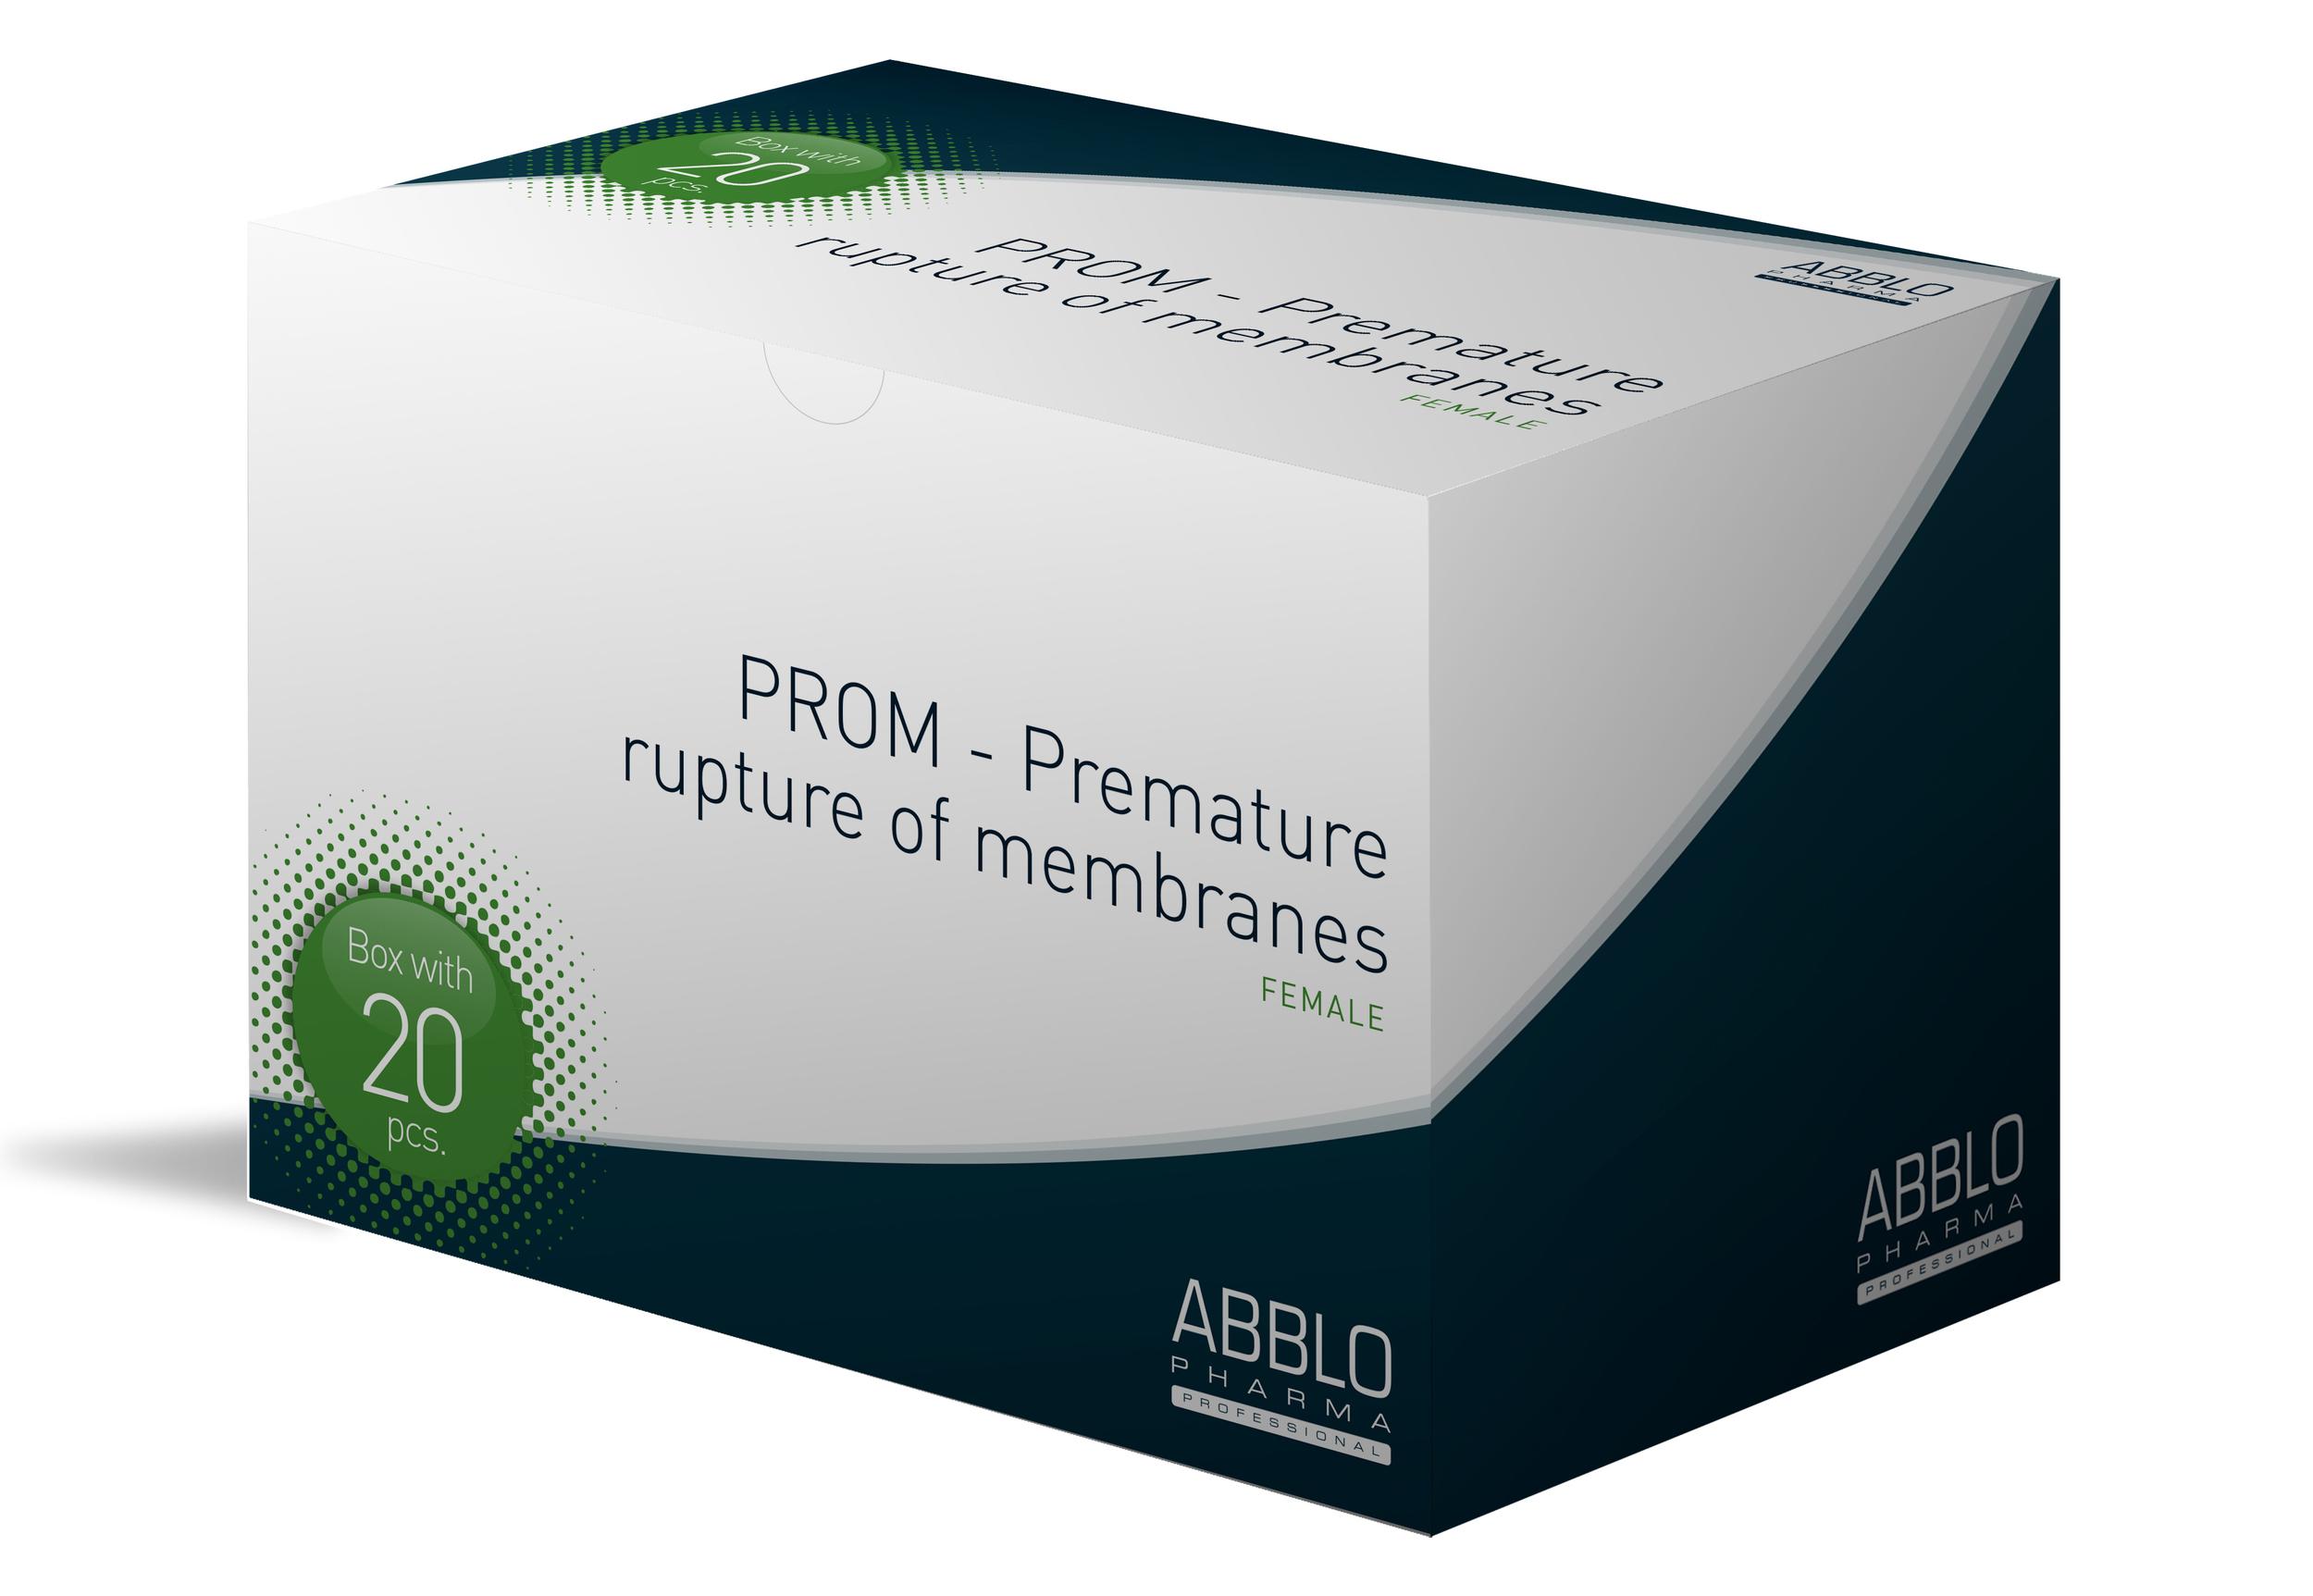 ABBLO_Pharma_Professionals_PROM_Premature_rupture_of_membranes